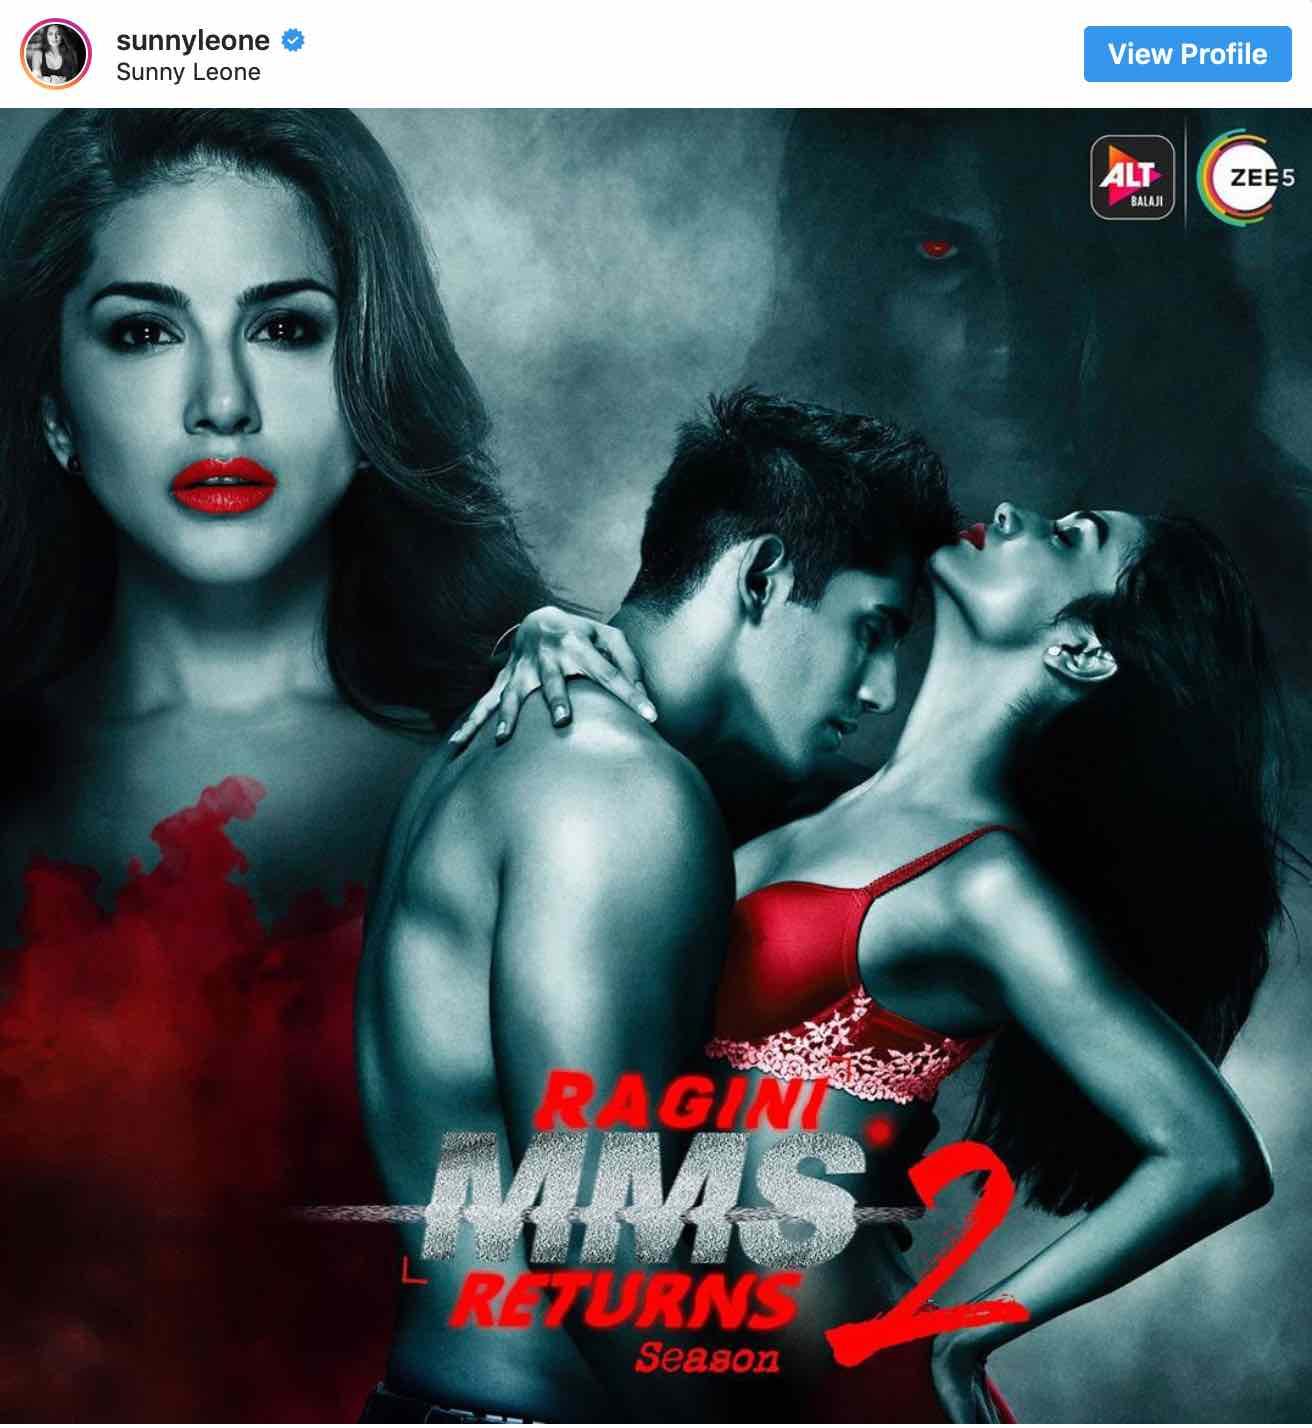 ragini-mms-returns-season-2-release-date